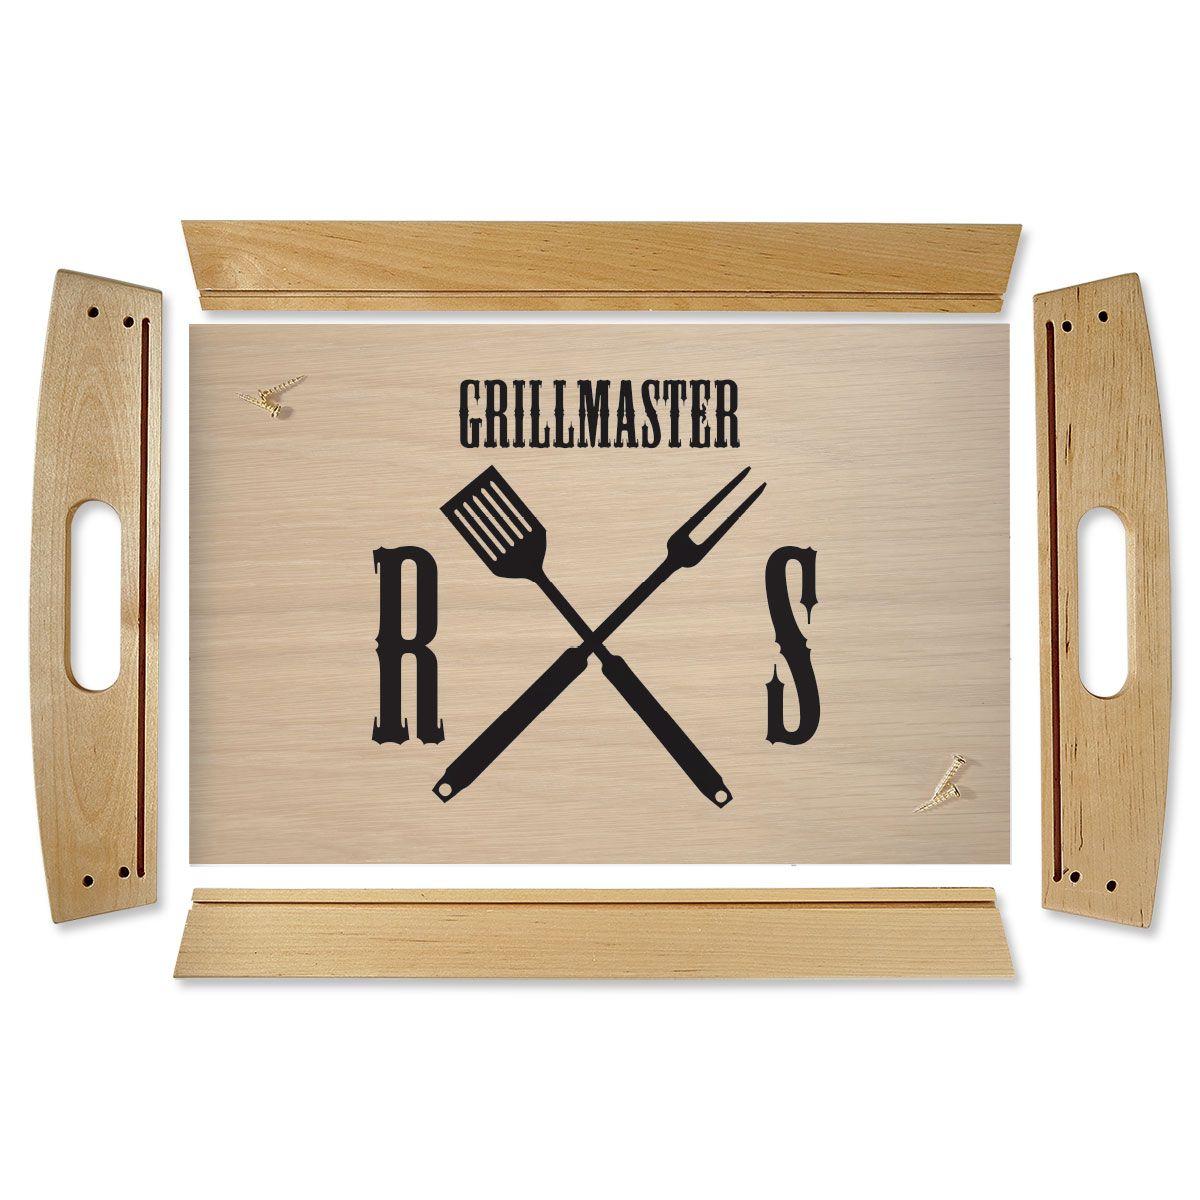 Custom Grillmaster Natural Wood Serving Tray